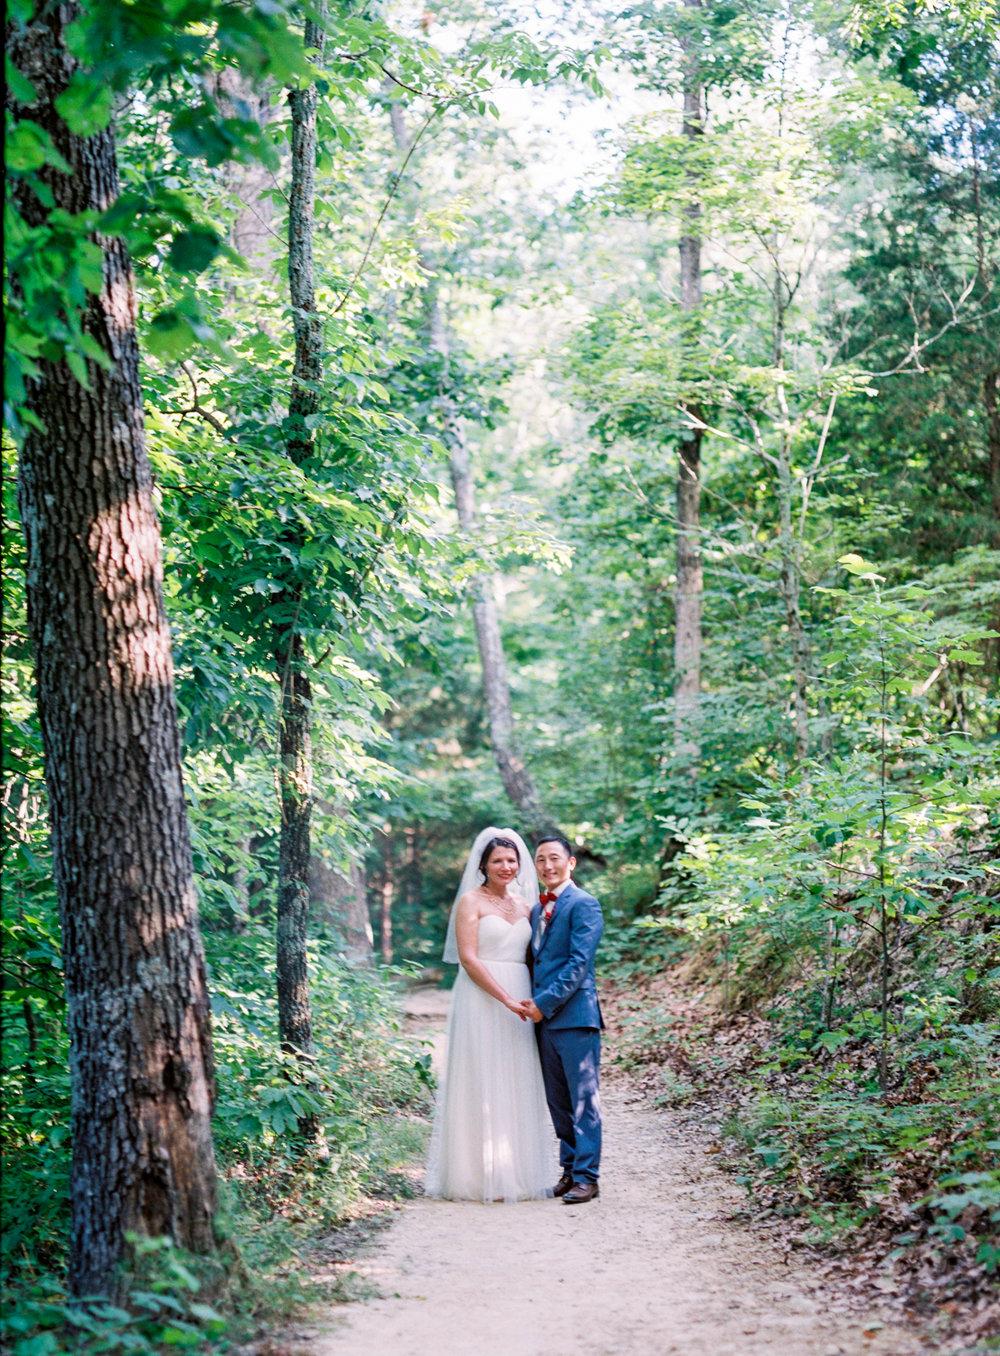 Leaf-&-Pine-Lindsey-Kaiphen-Wedding-21.jpg